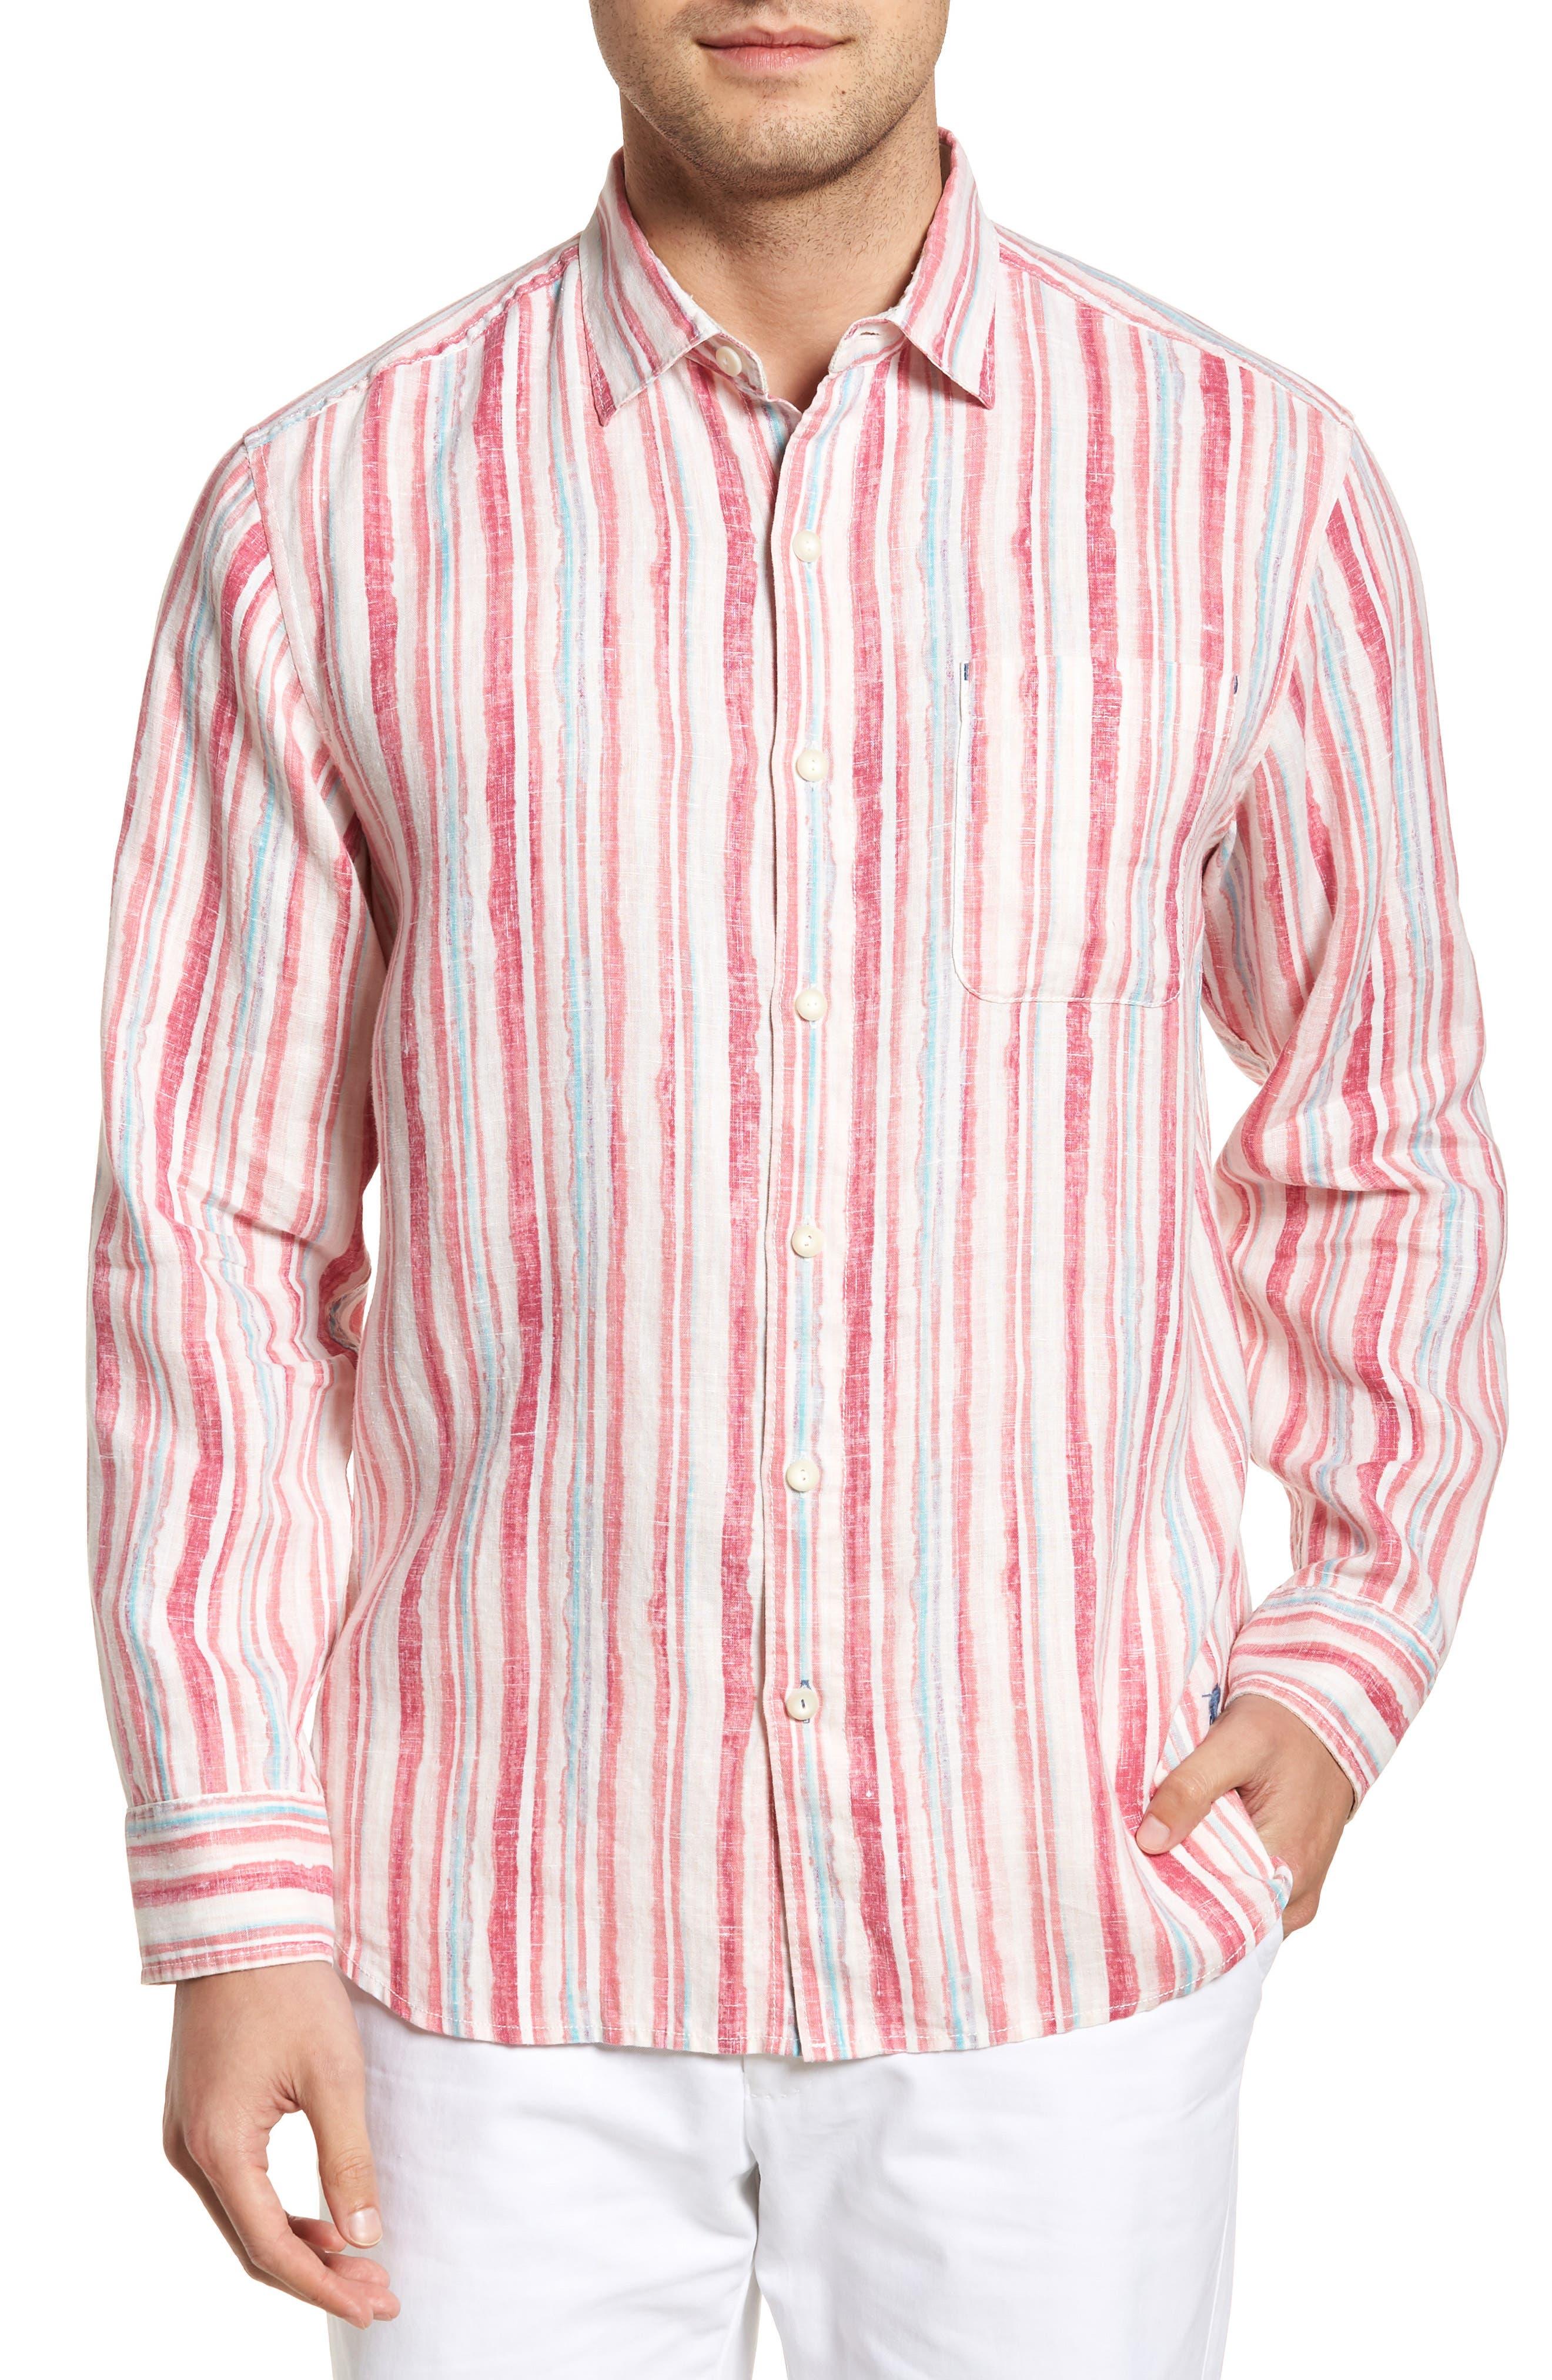 Alternate Image 1 Selected - Tommy Bahama Watercrest Stripe Linen Sport Shirt